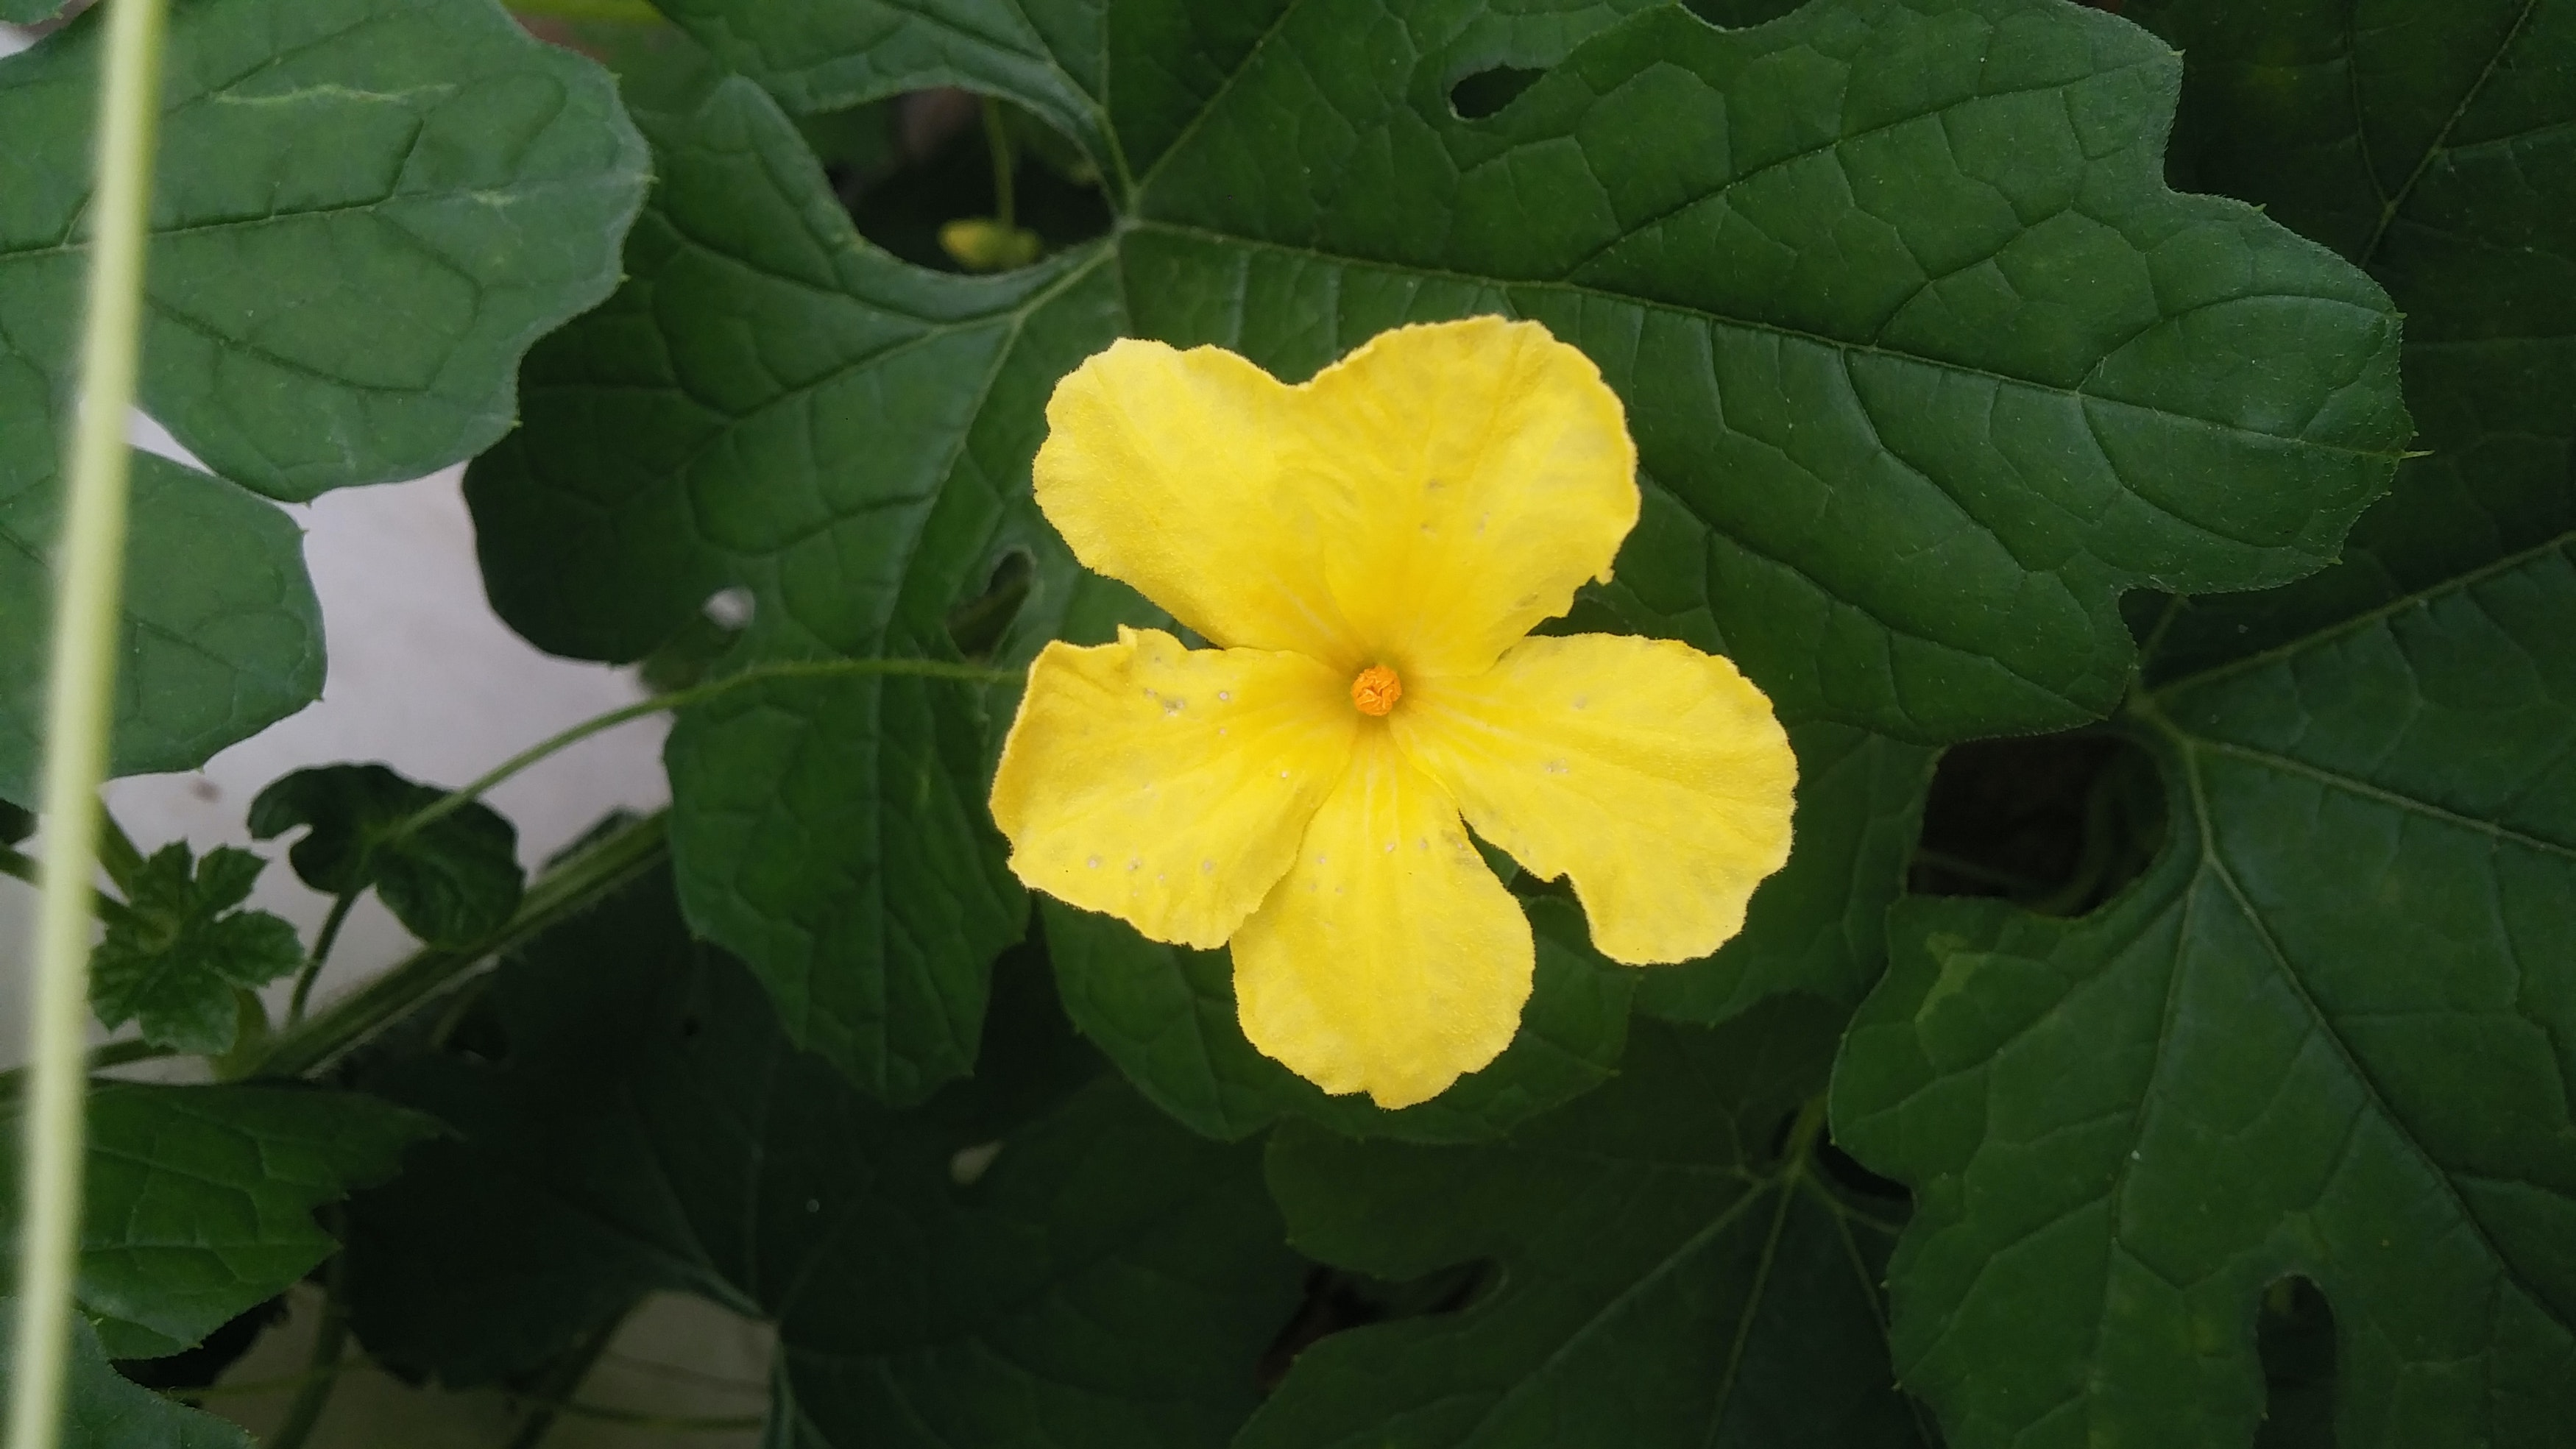 Free stock photo of beautiful flowers flowers yellow free download izmirmasajfo